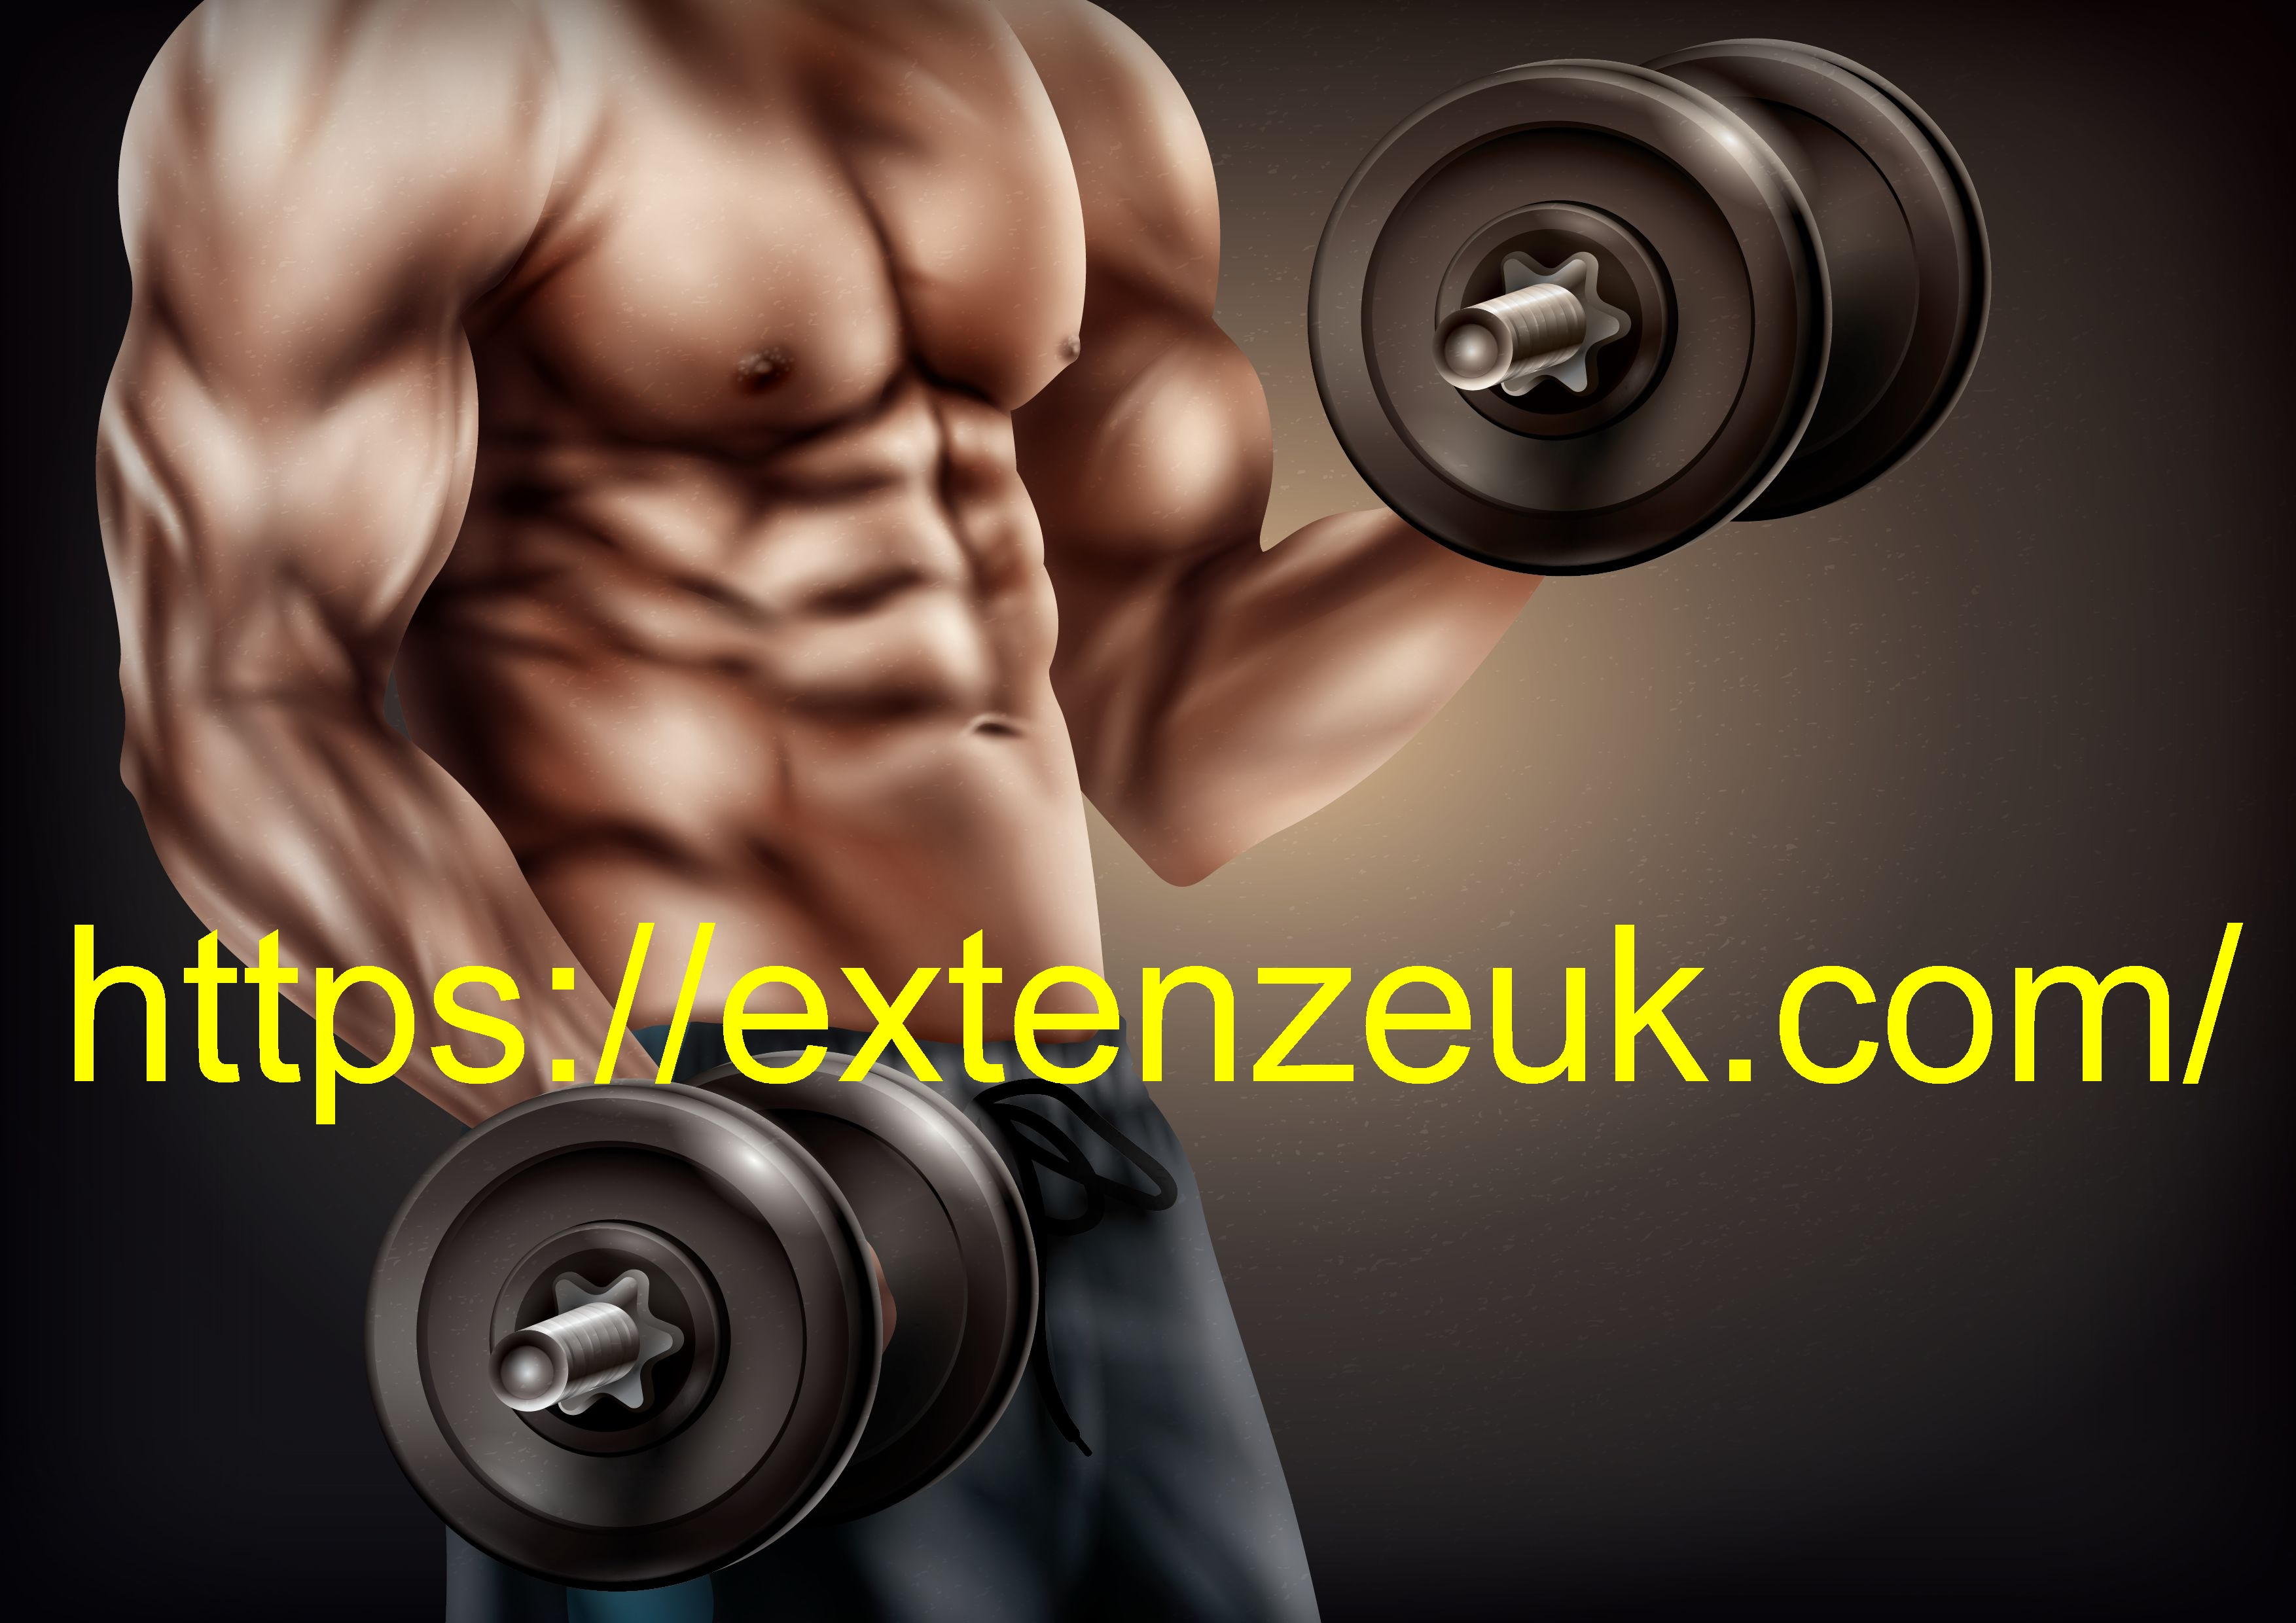 ExtenZe UK